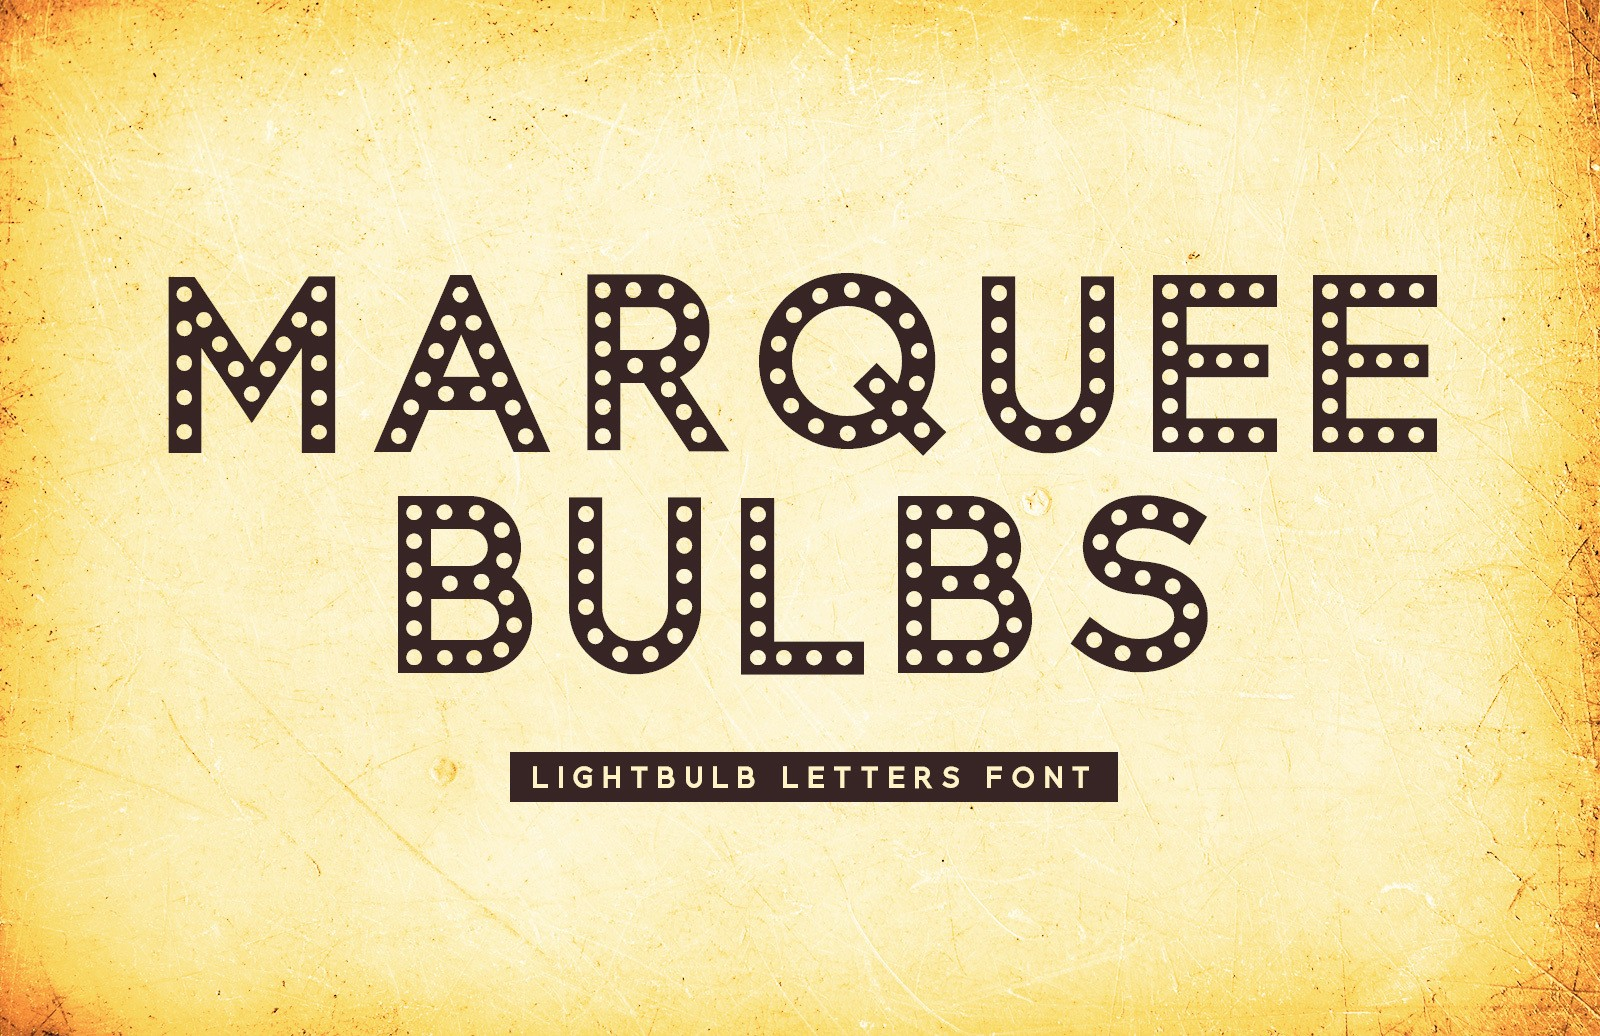 Marquee Bulbs - Lightbulb Letters Font